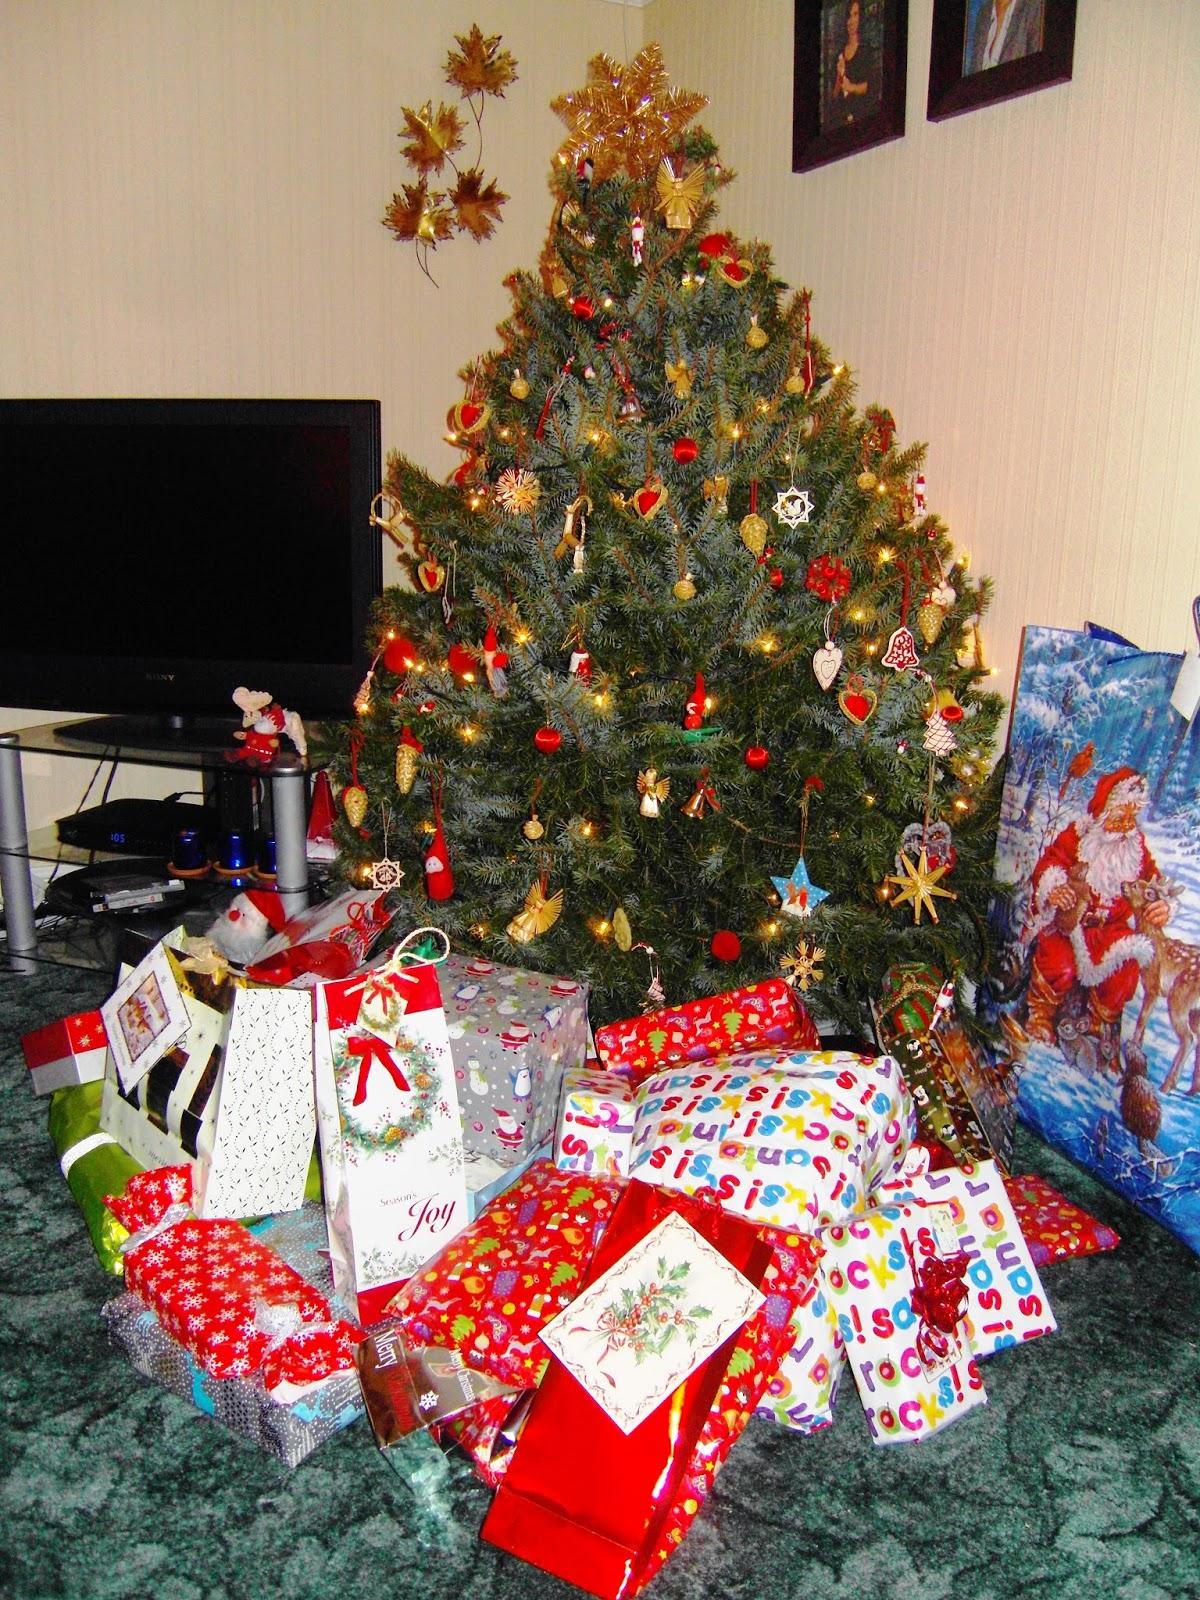 http://multilingualparenting.com/2013/12/19/our-christmas/